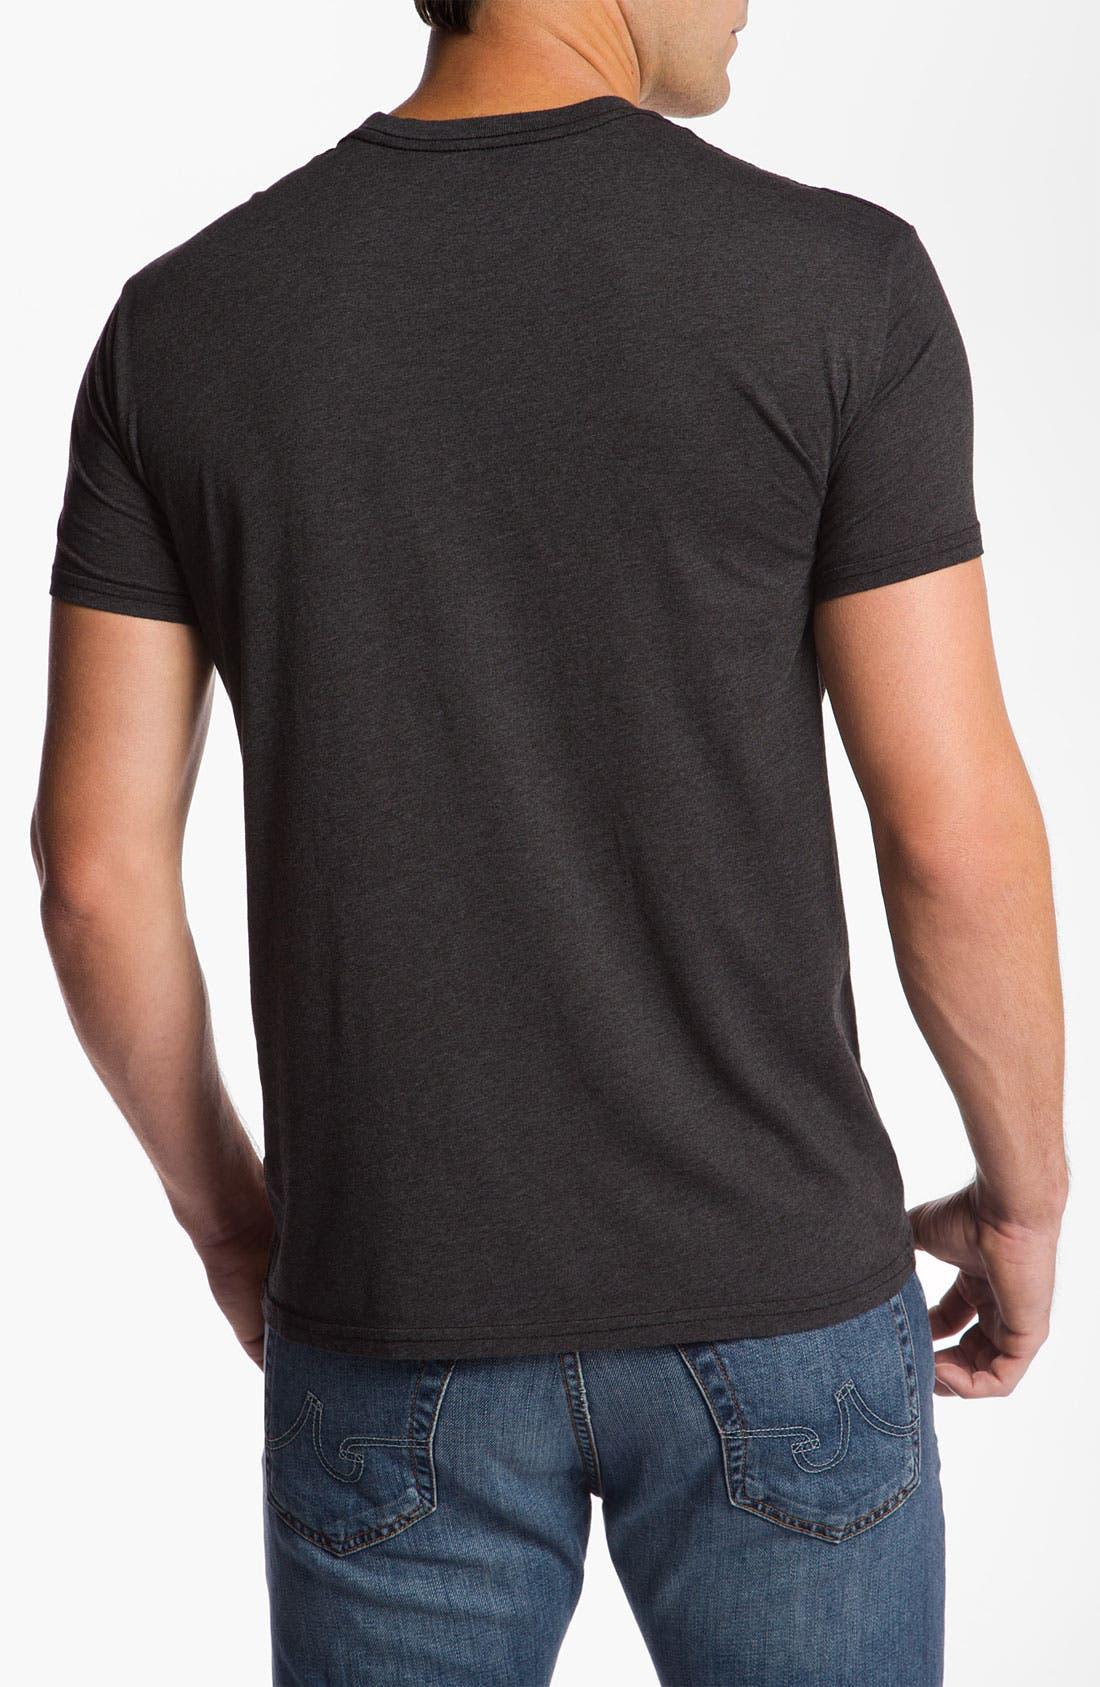 Alternate Image 2  - The Original Retro Brand 'Wisconsin Badgers' T-Shirt